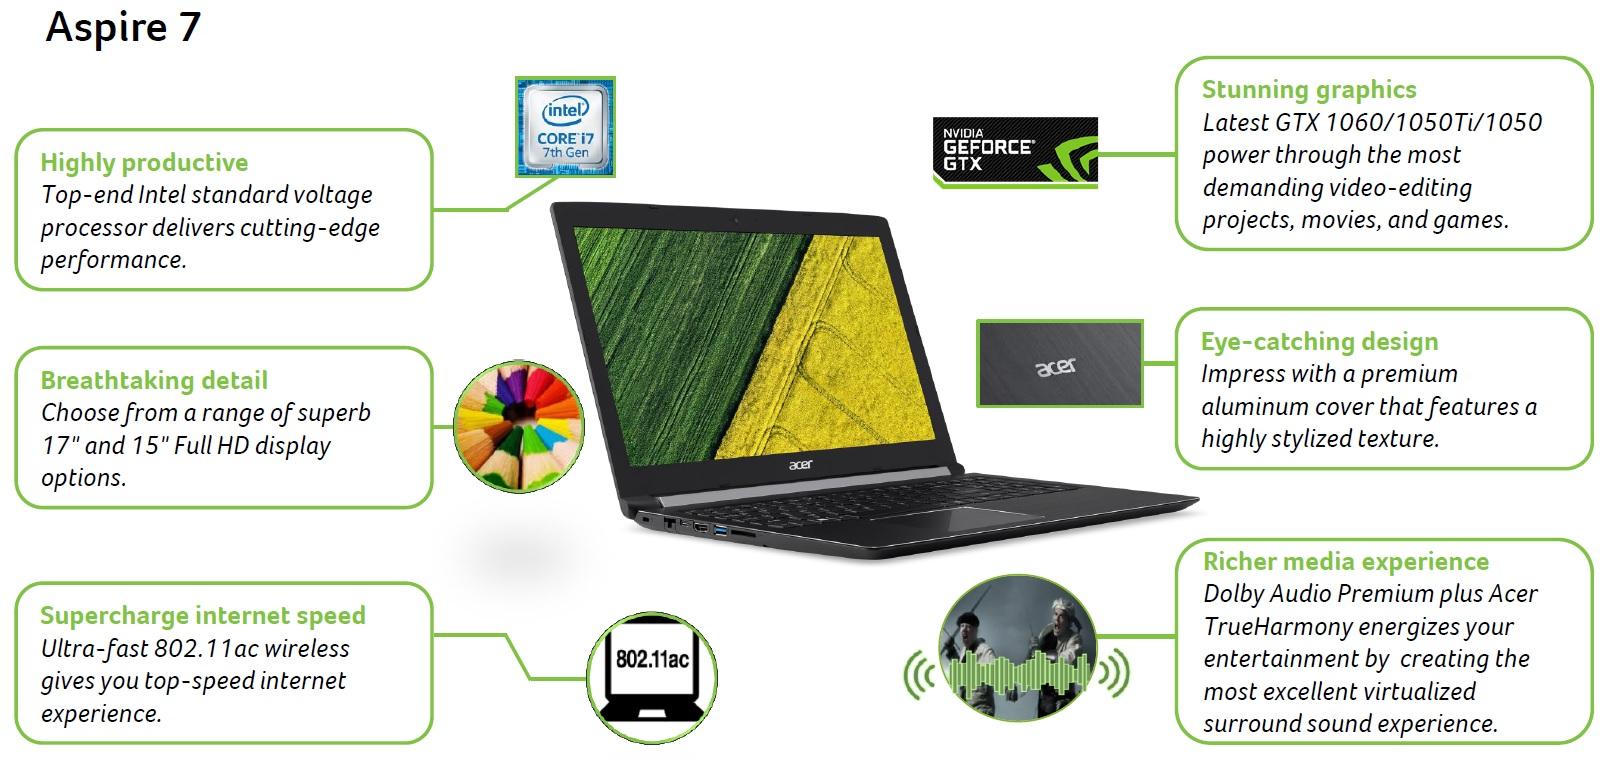 Acer Aspire 7 600 04